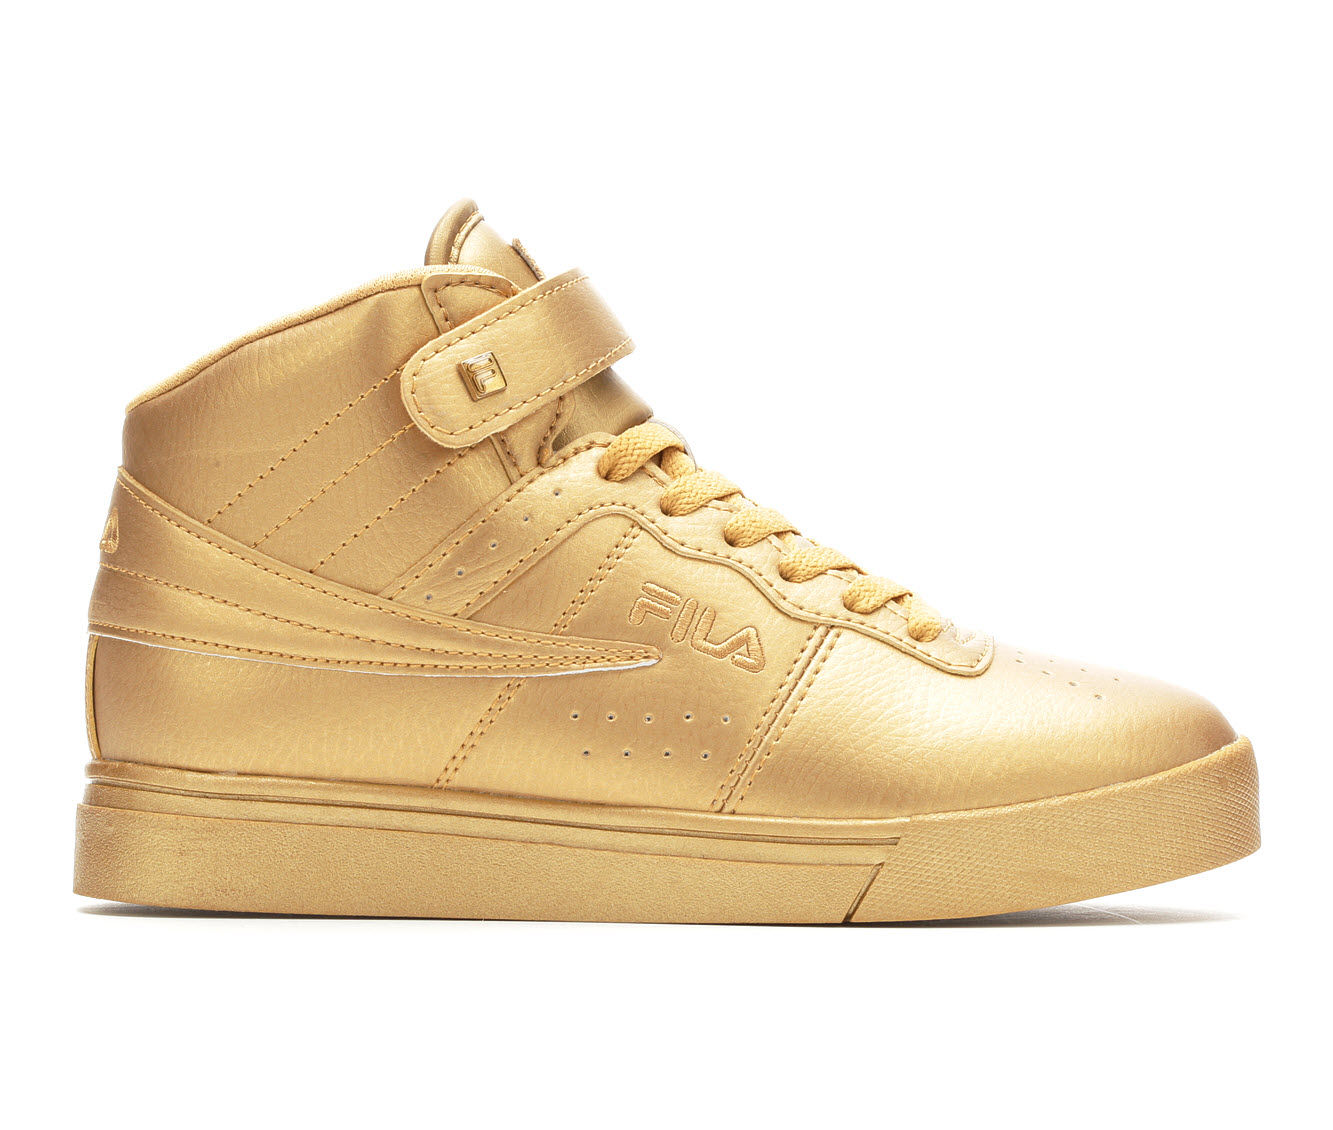 Fila Vulc 13 MP Metallic Stars Women's Athletic Shoe (Gold)